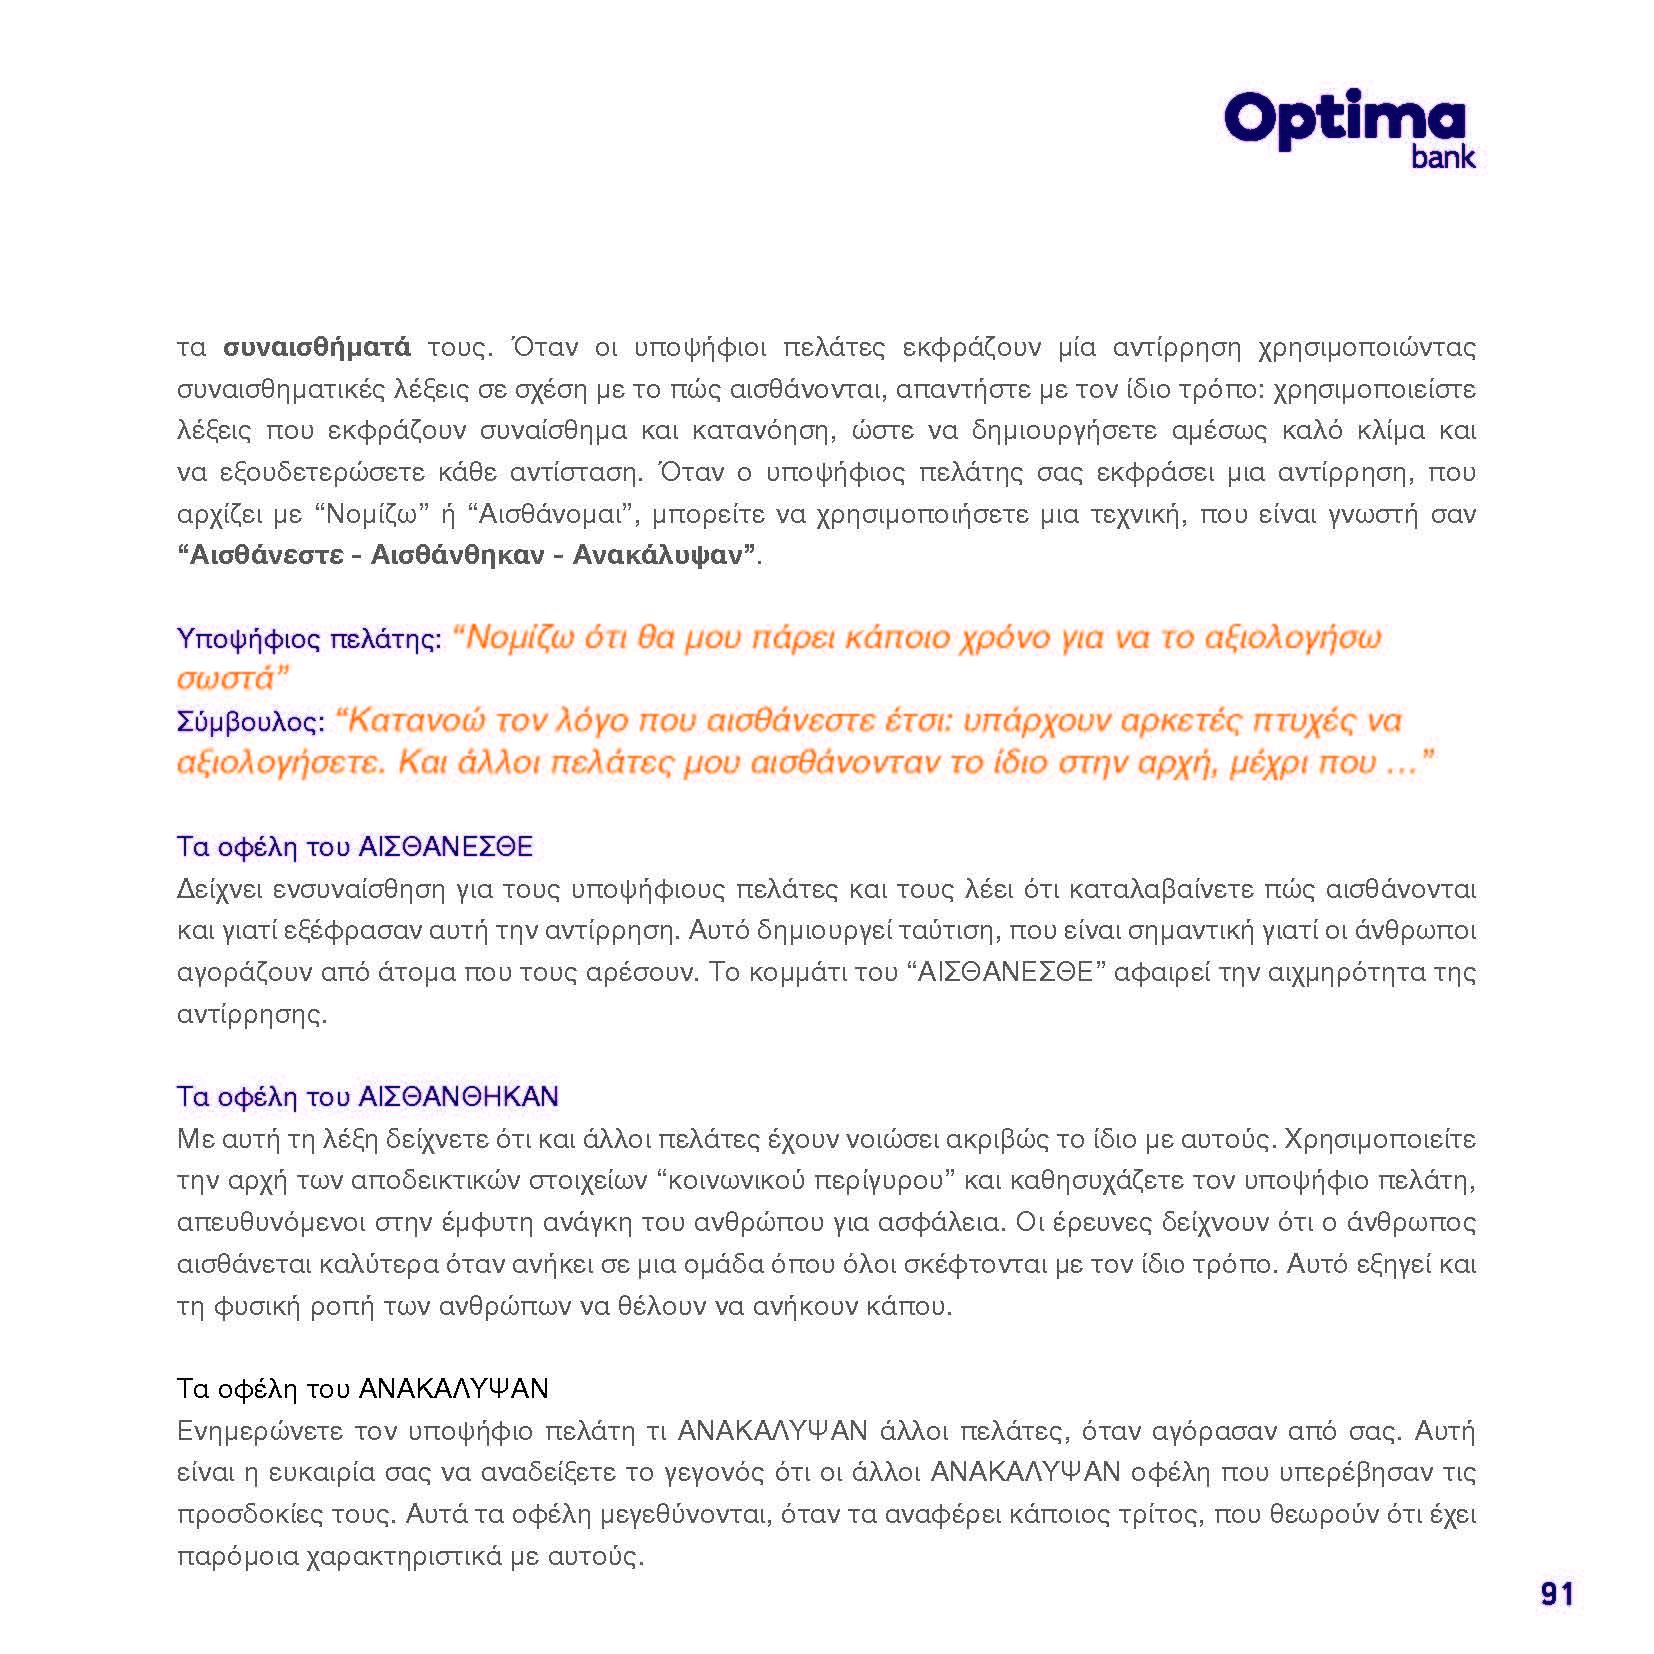 https://www.jib.gr/wp-content/uploads/2020/09/OPTIMA-BANK-BOOKLET-WEB_Page_091.jpg